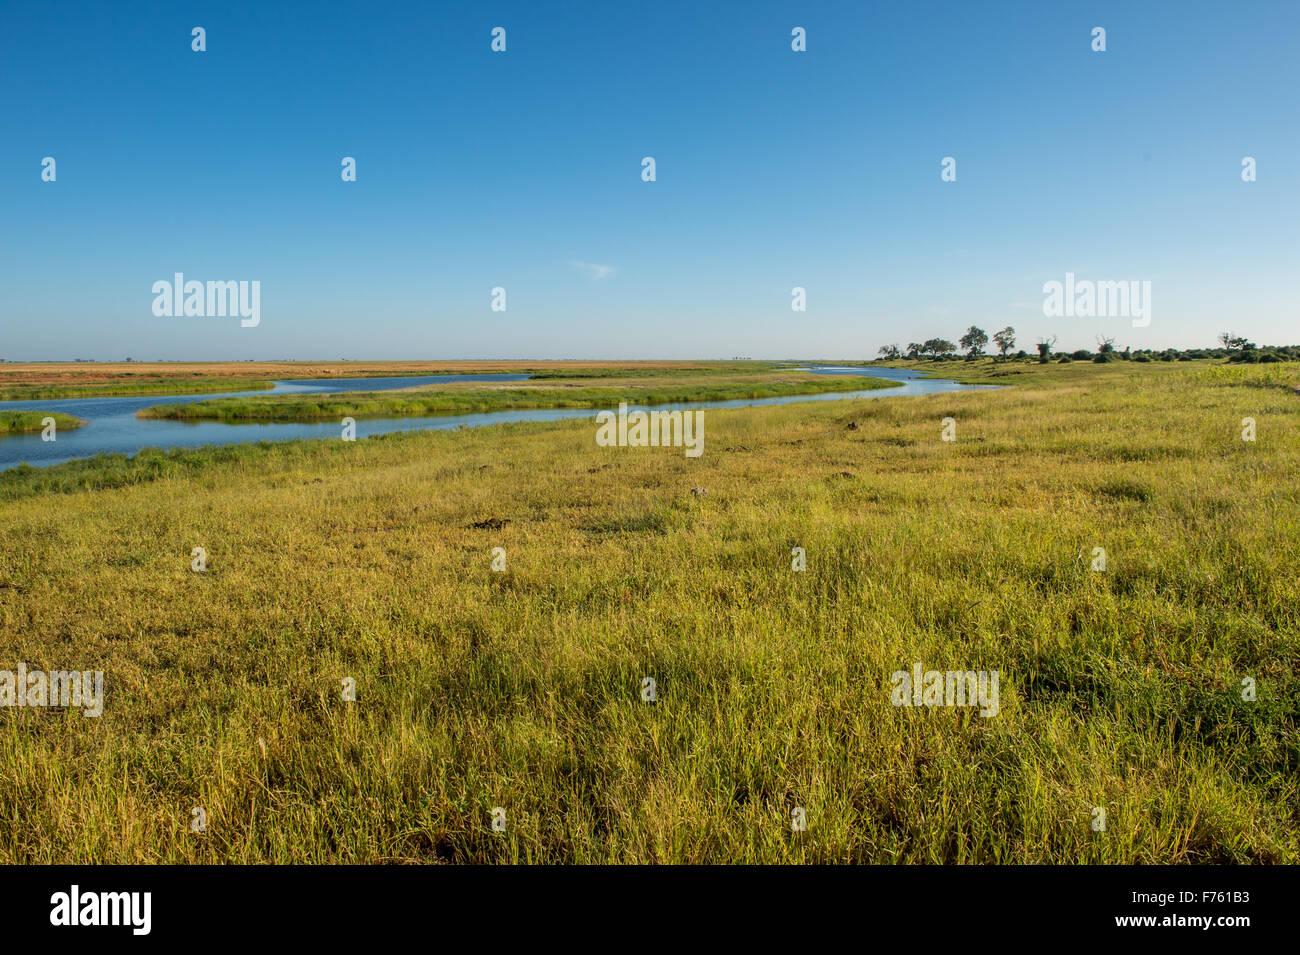 Kasane, Botswana - Chobe National Park - Stock Image